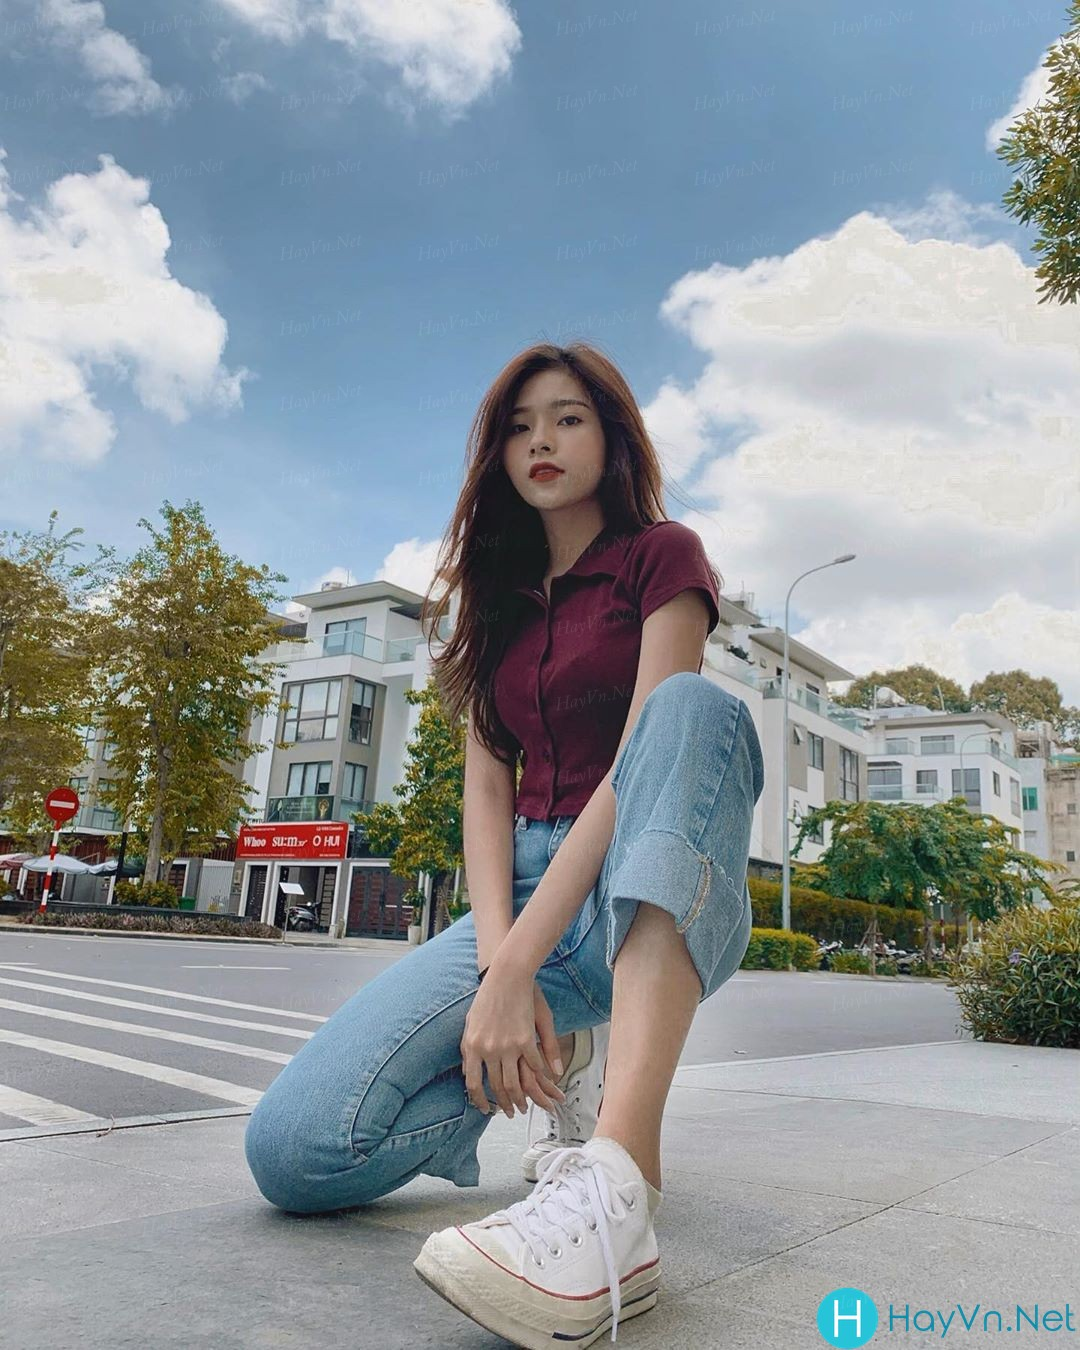 Model Minh Tuyền | E-CUP